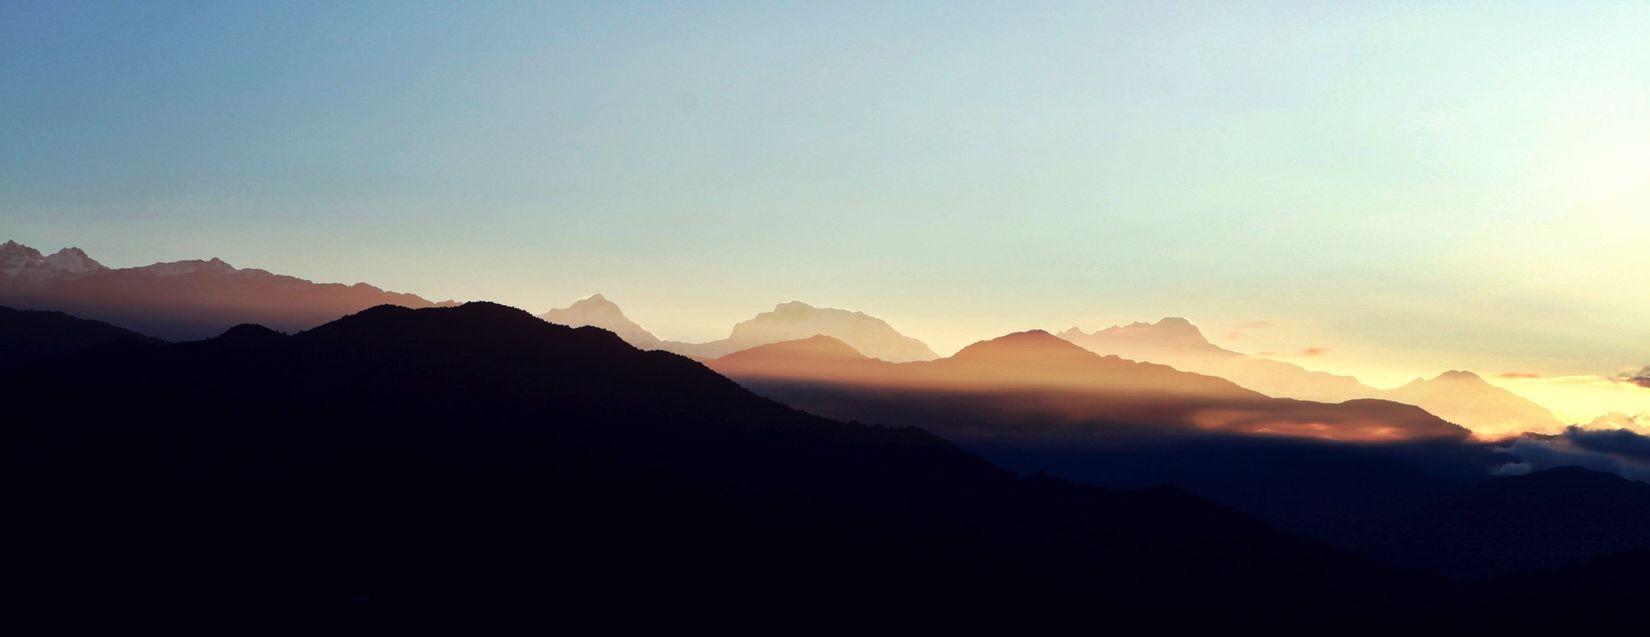 Nepal Memory Of Travel 2014 Travel taken at porkara ❤️拍于博卡拉 the mountain is awake under sunlight